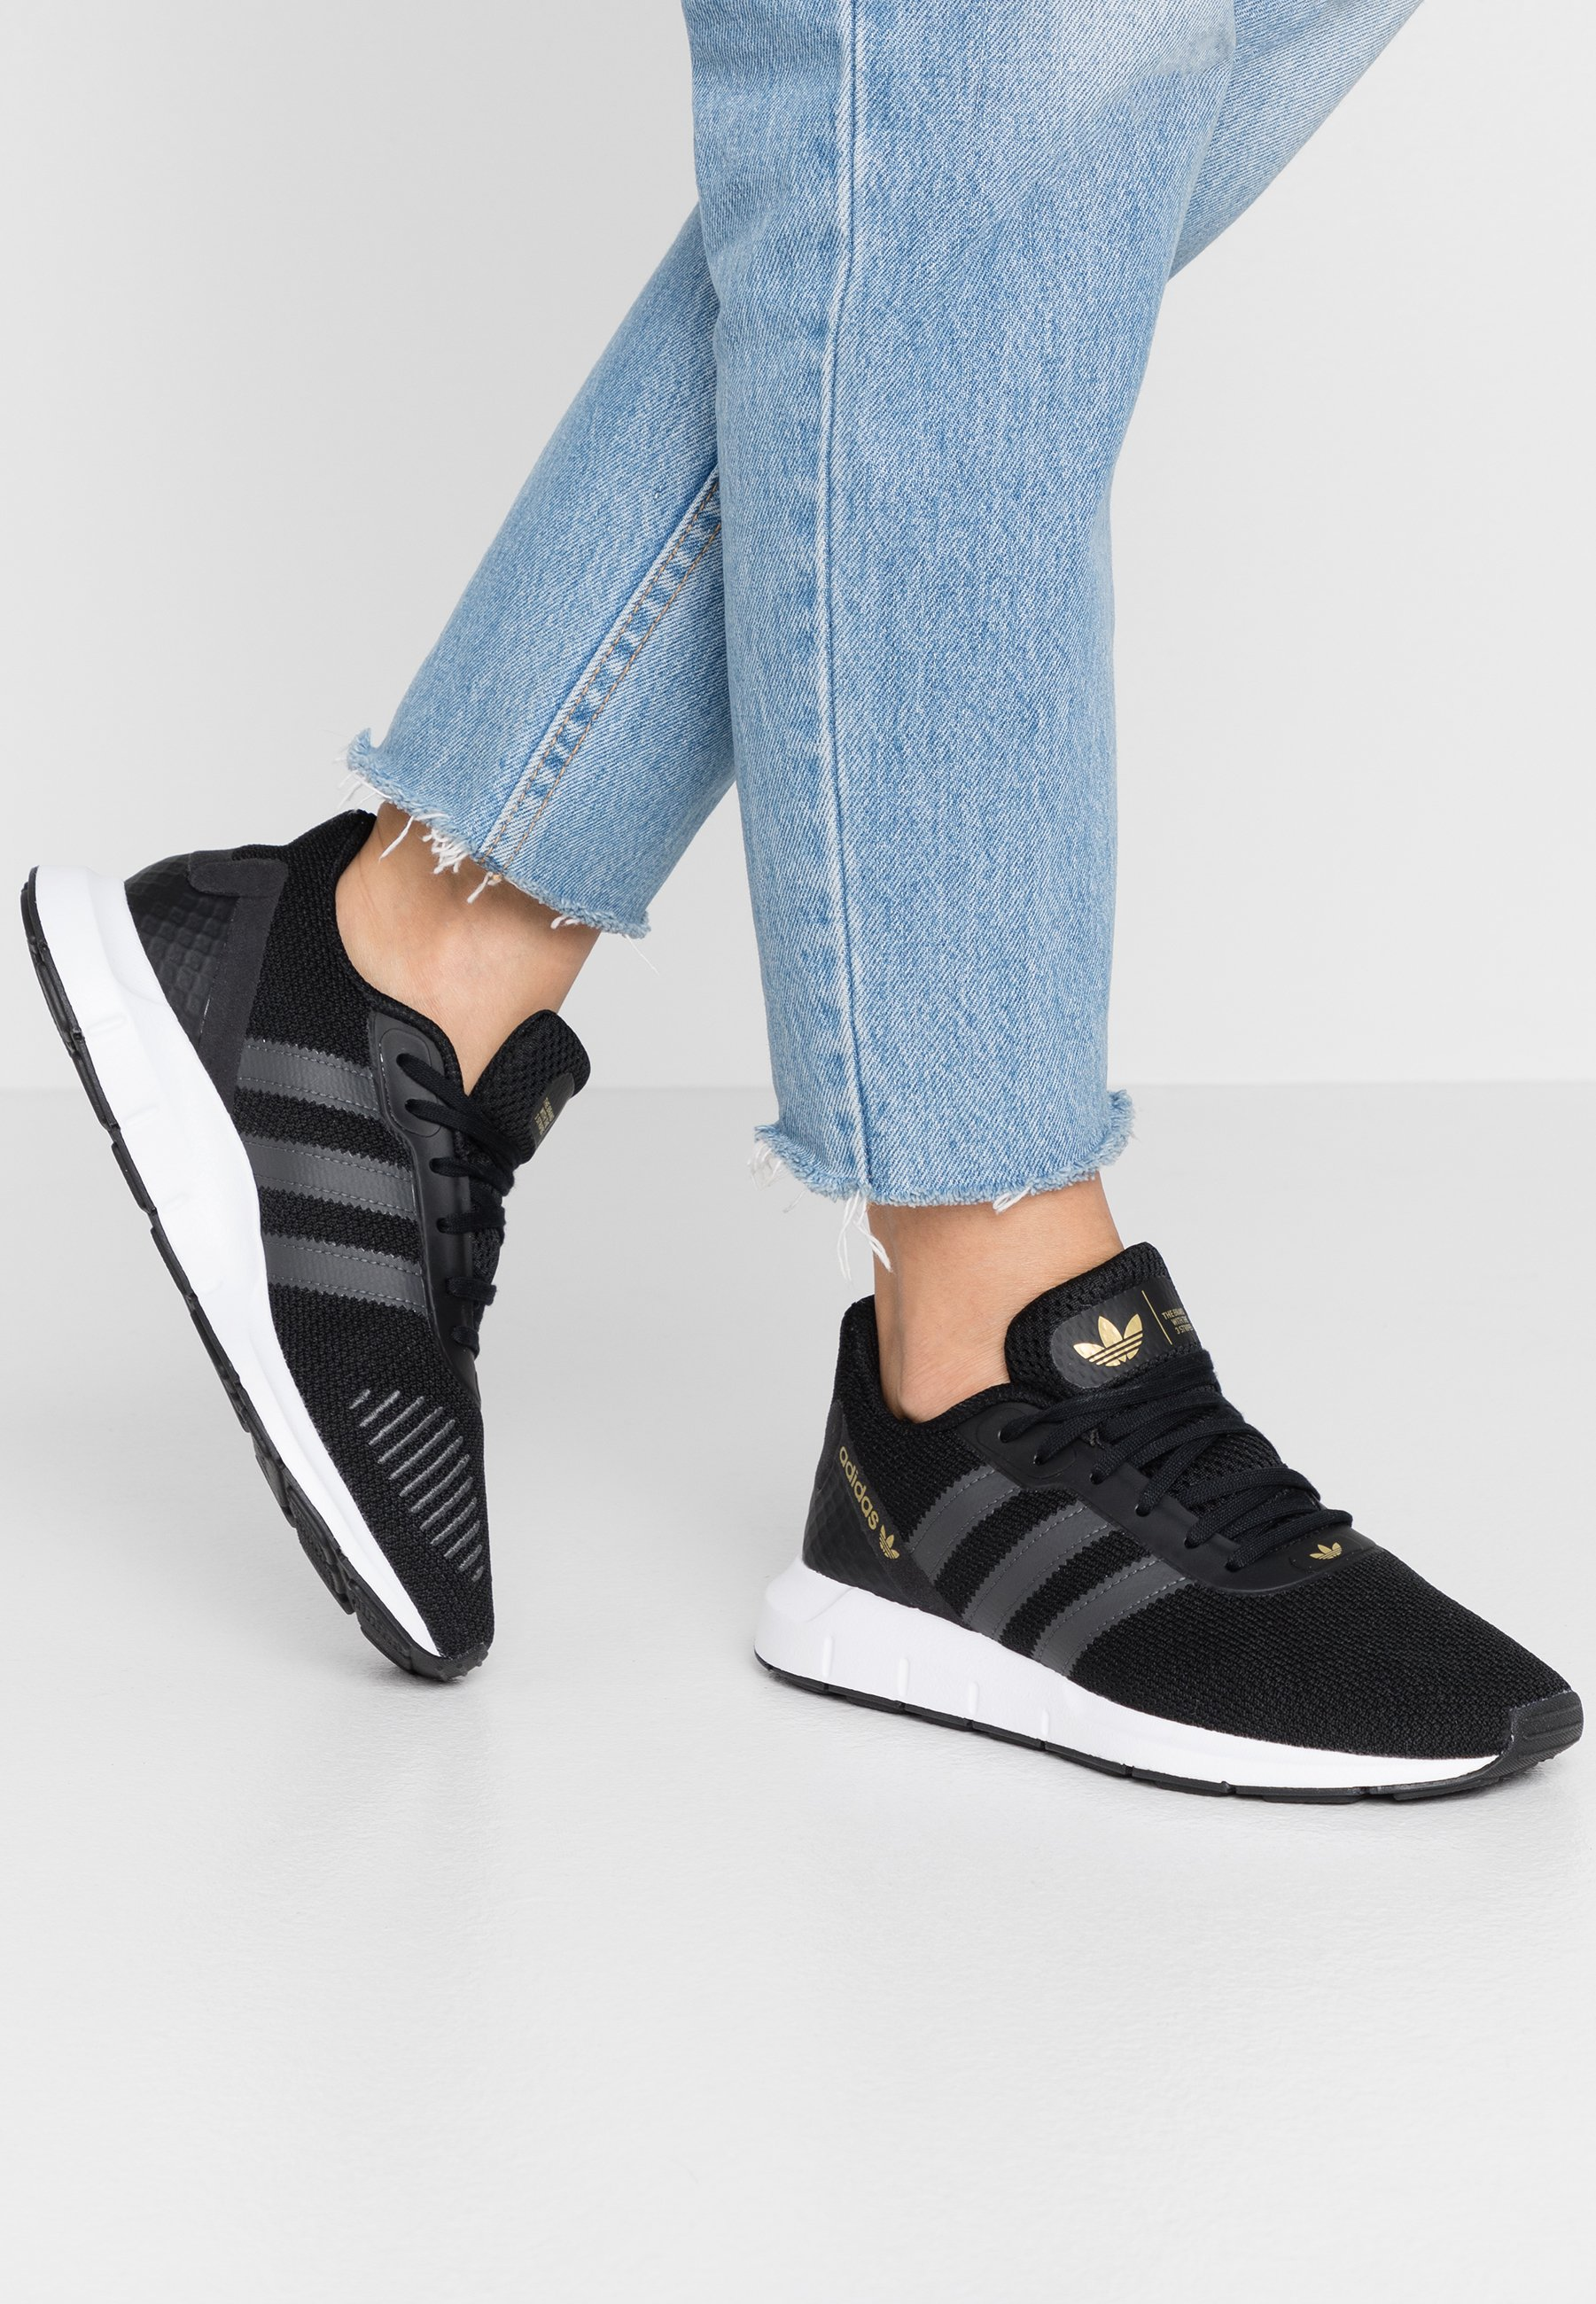 Adidas Originals Swift - Baskets Basses Clear Black/grey Six/footwear White